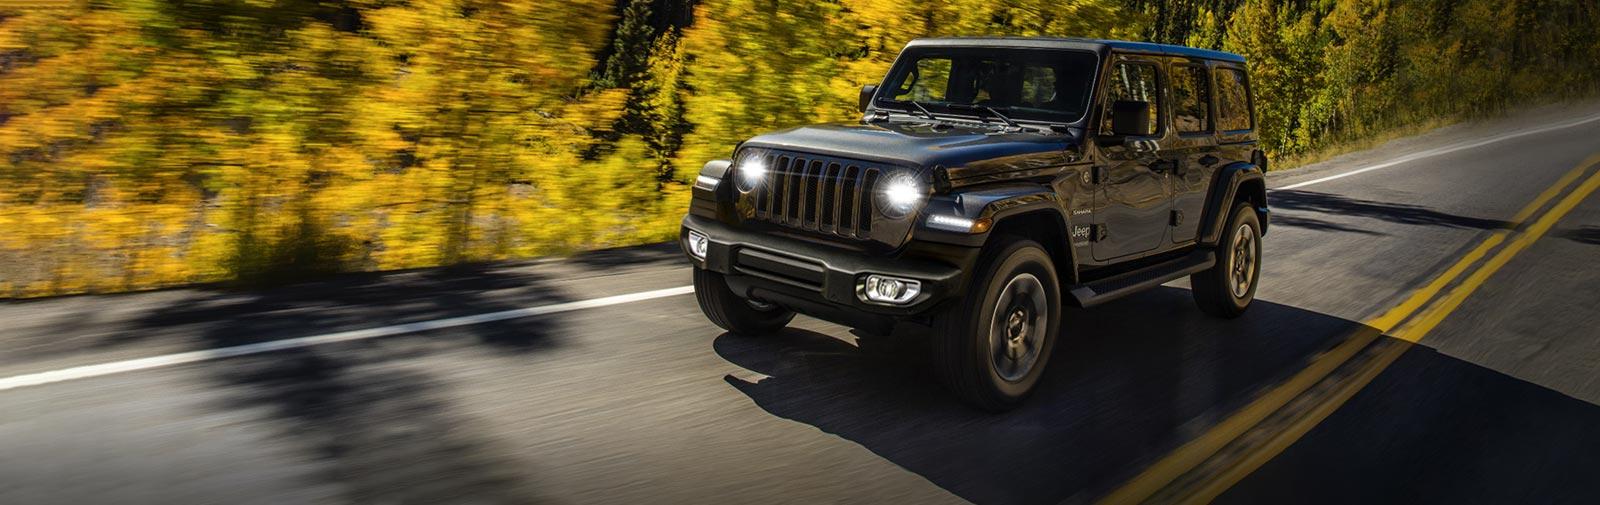 Jeep Wrangler Unlimited Torino